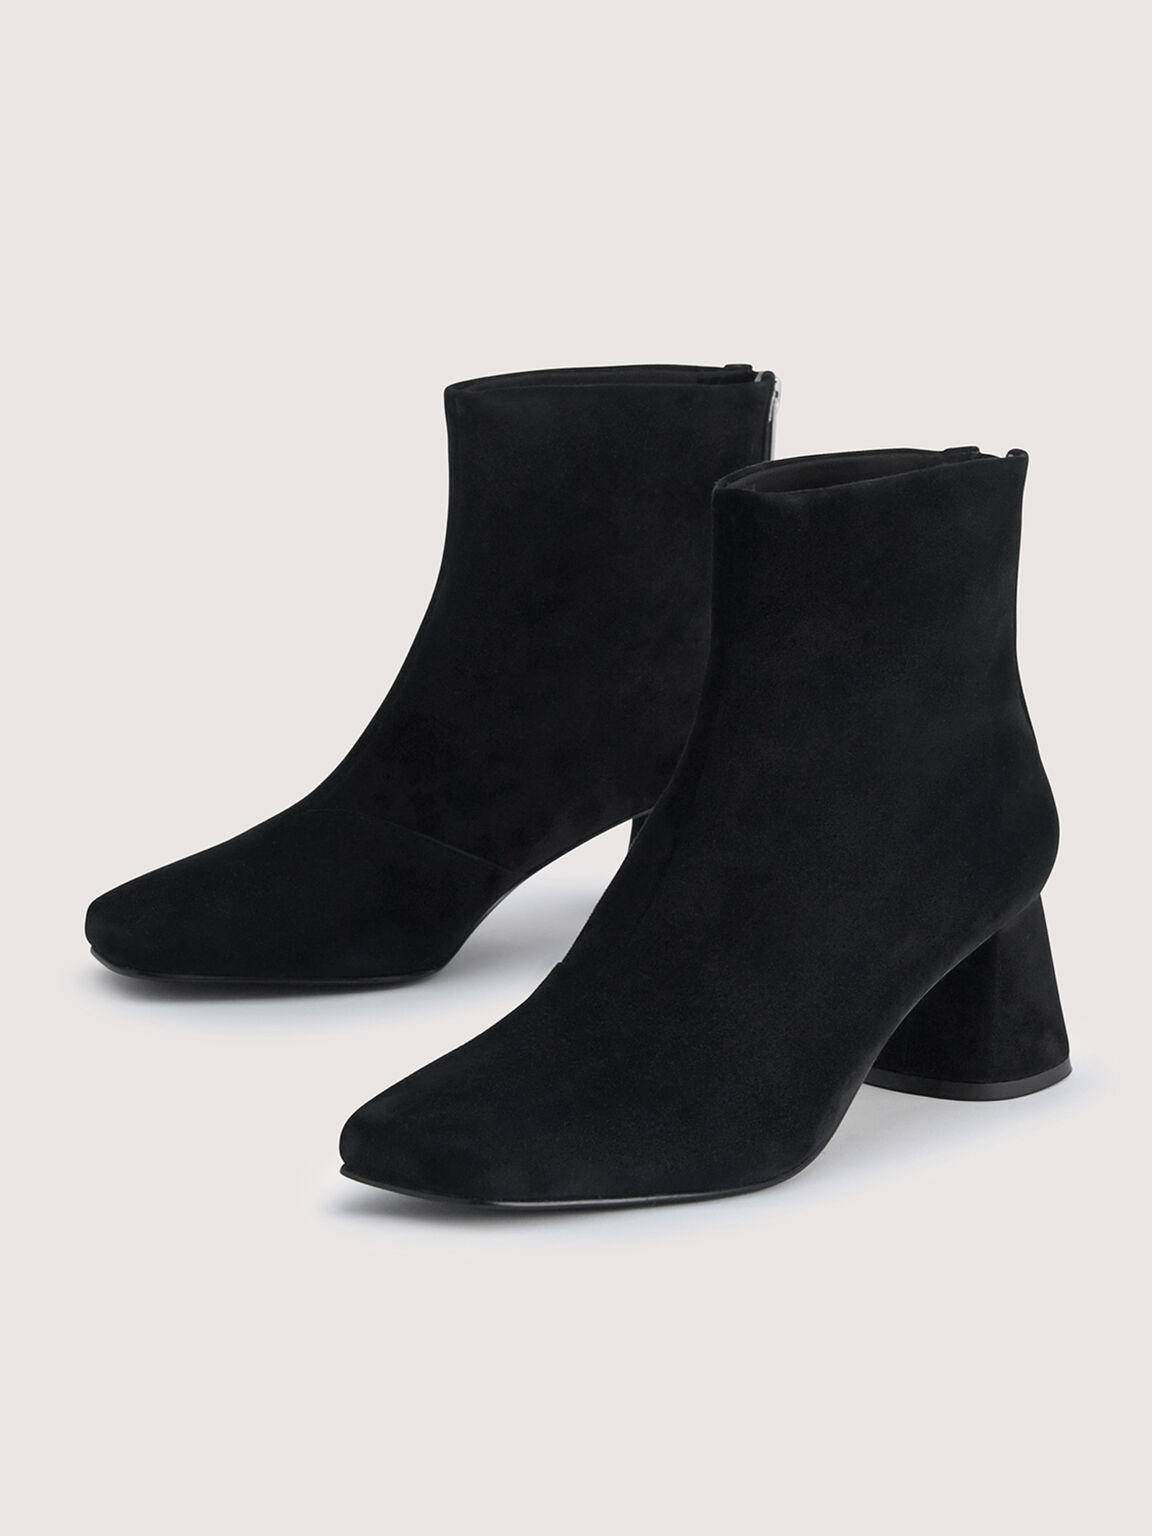 Suede Ankle Boots, Black, hi-res